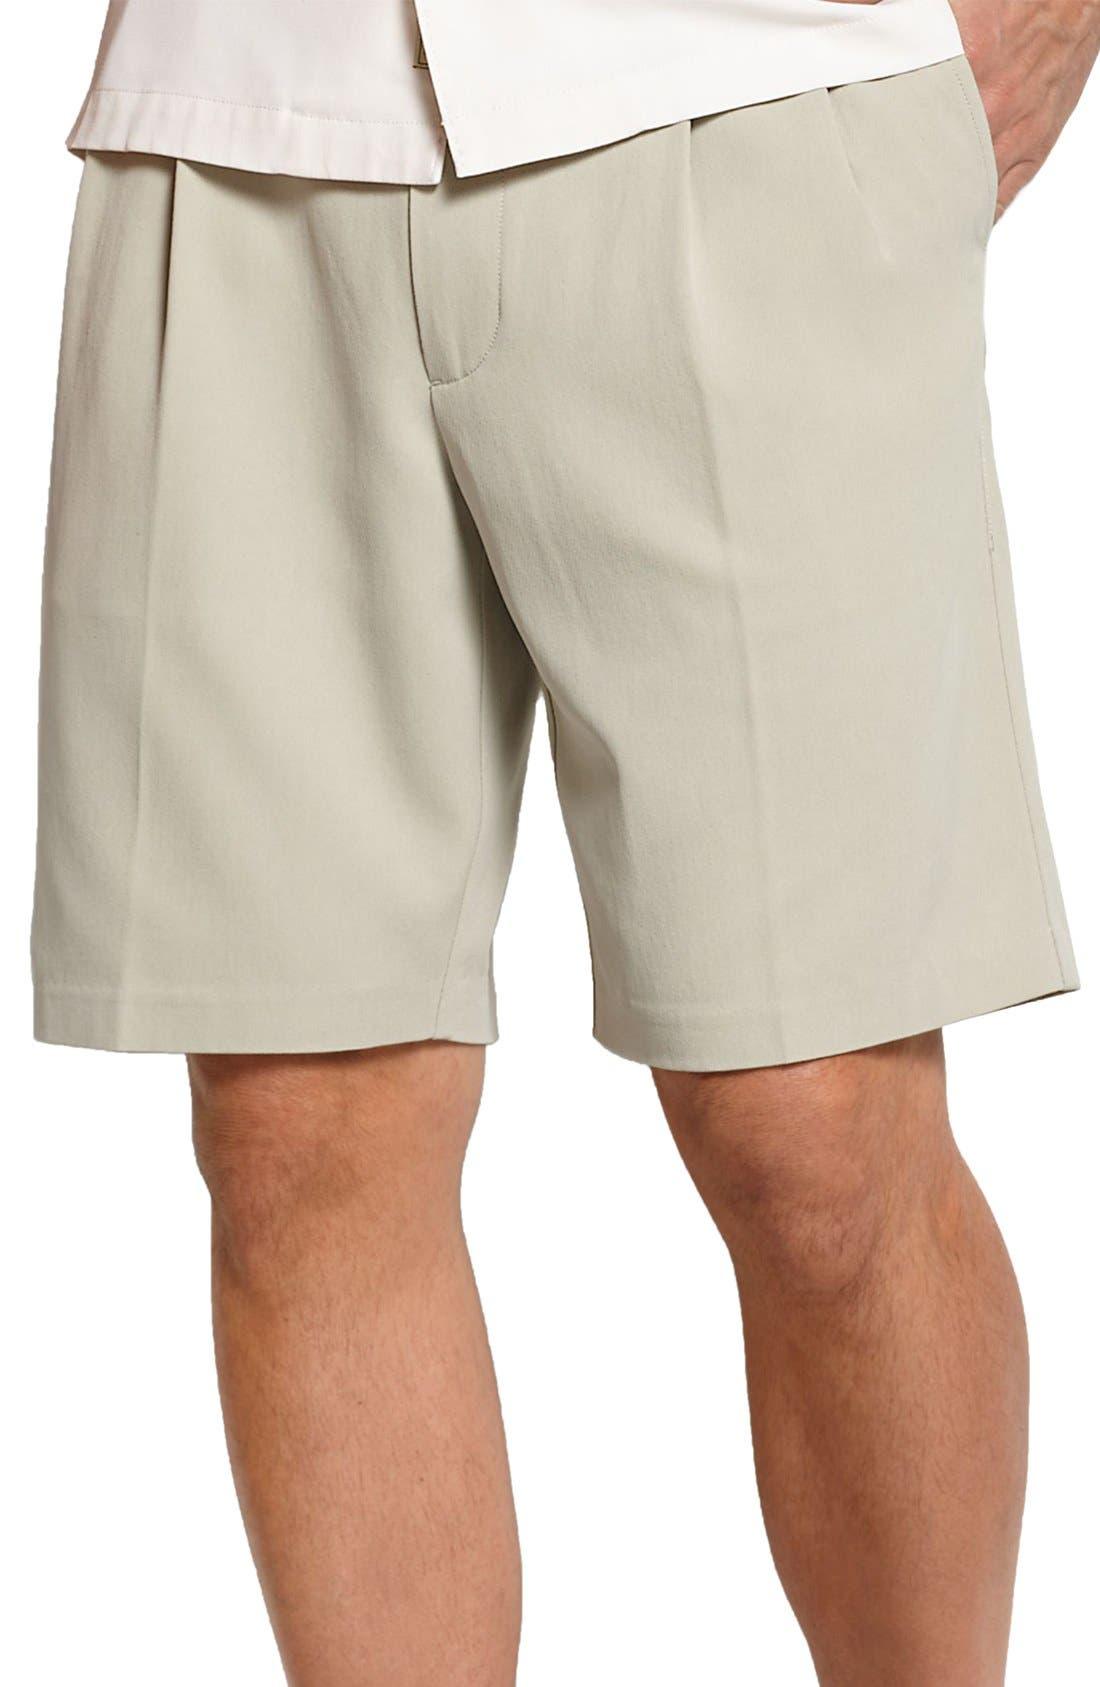 St. Thomas Pleated Shorts,                             Main thumbnail 5, color,